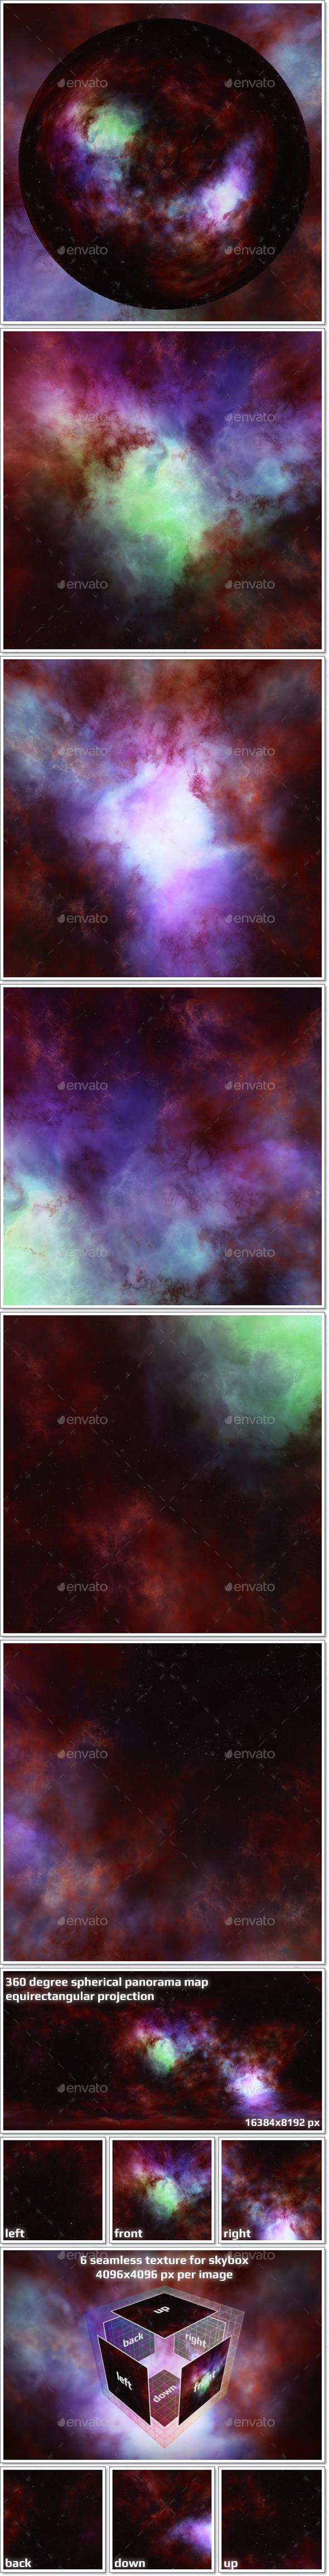 Nebula Space Environment HDRI Map 013 - 3DOcean Item for Sale